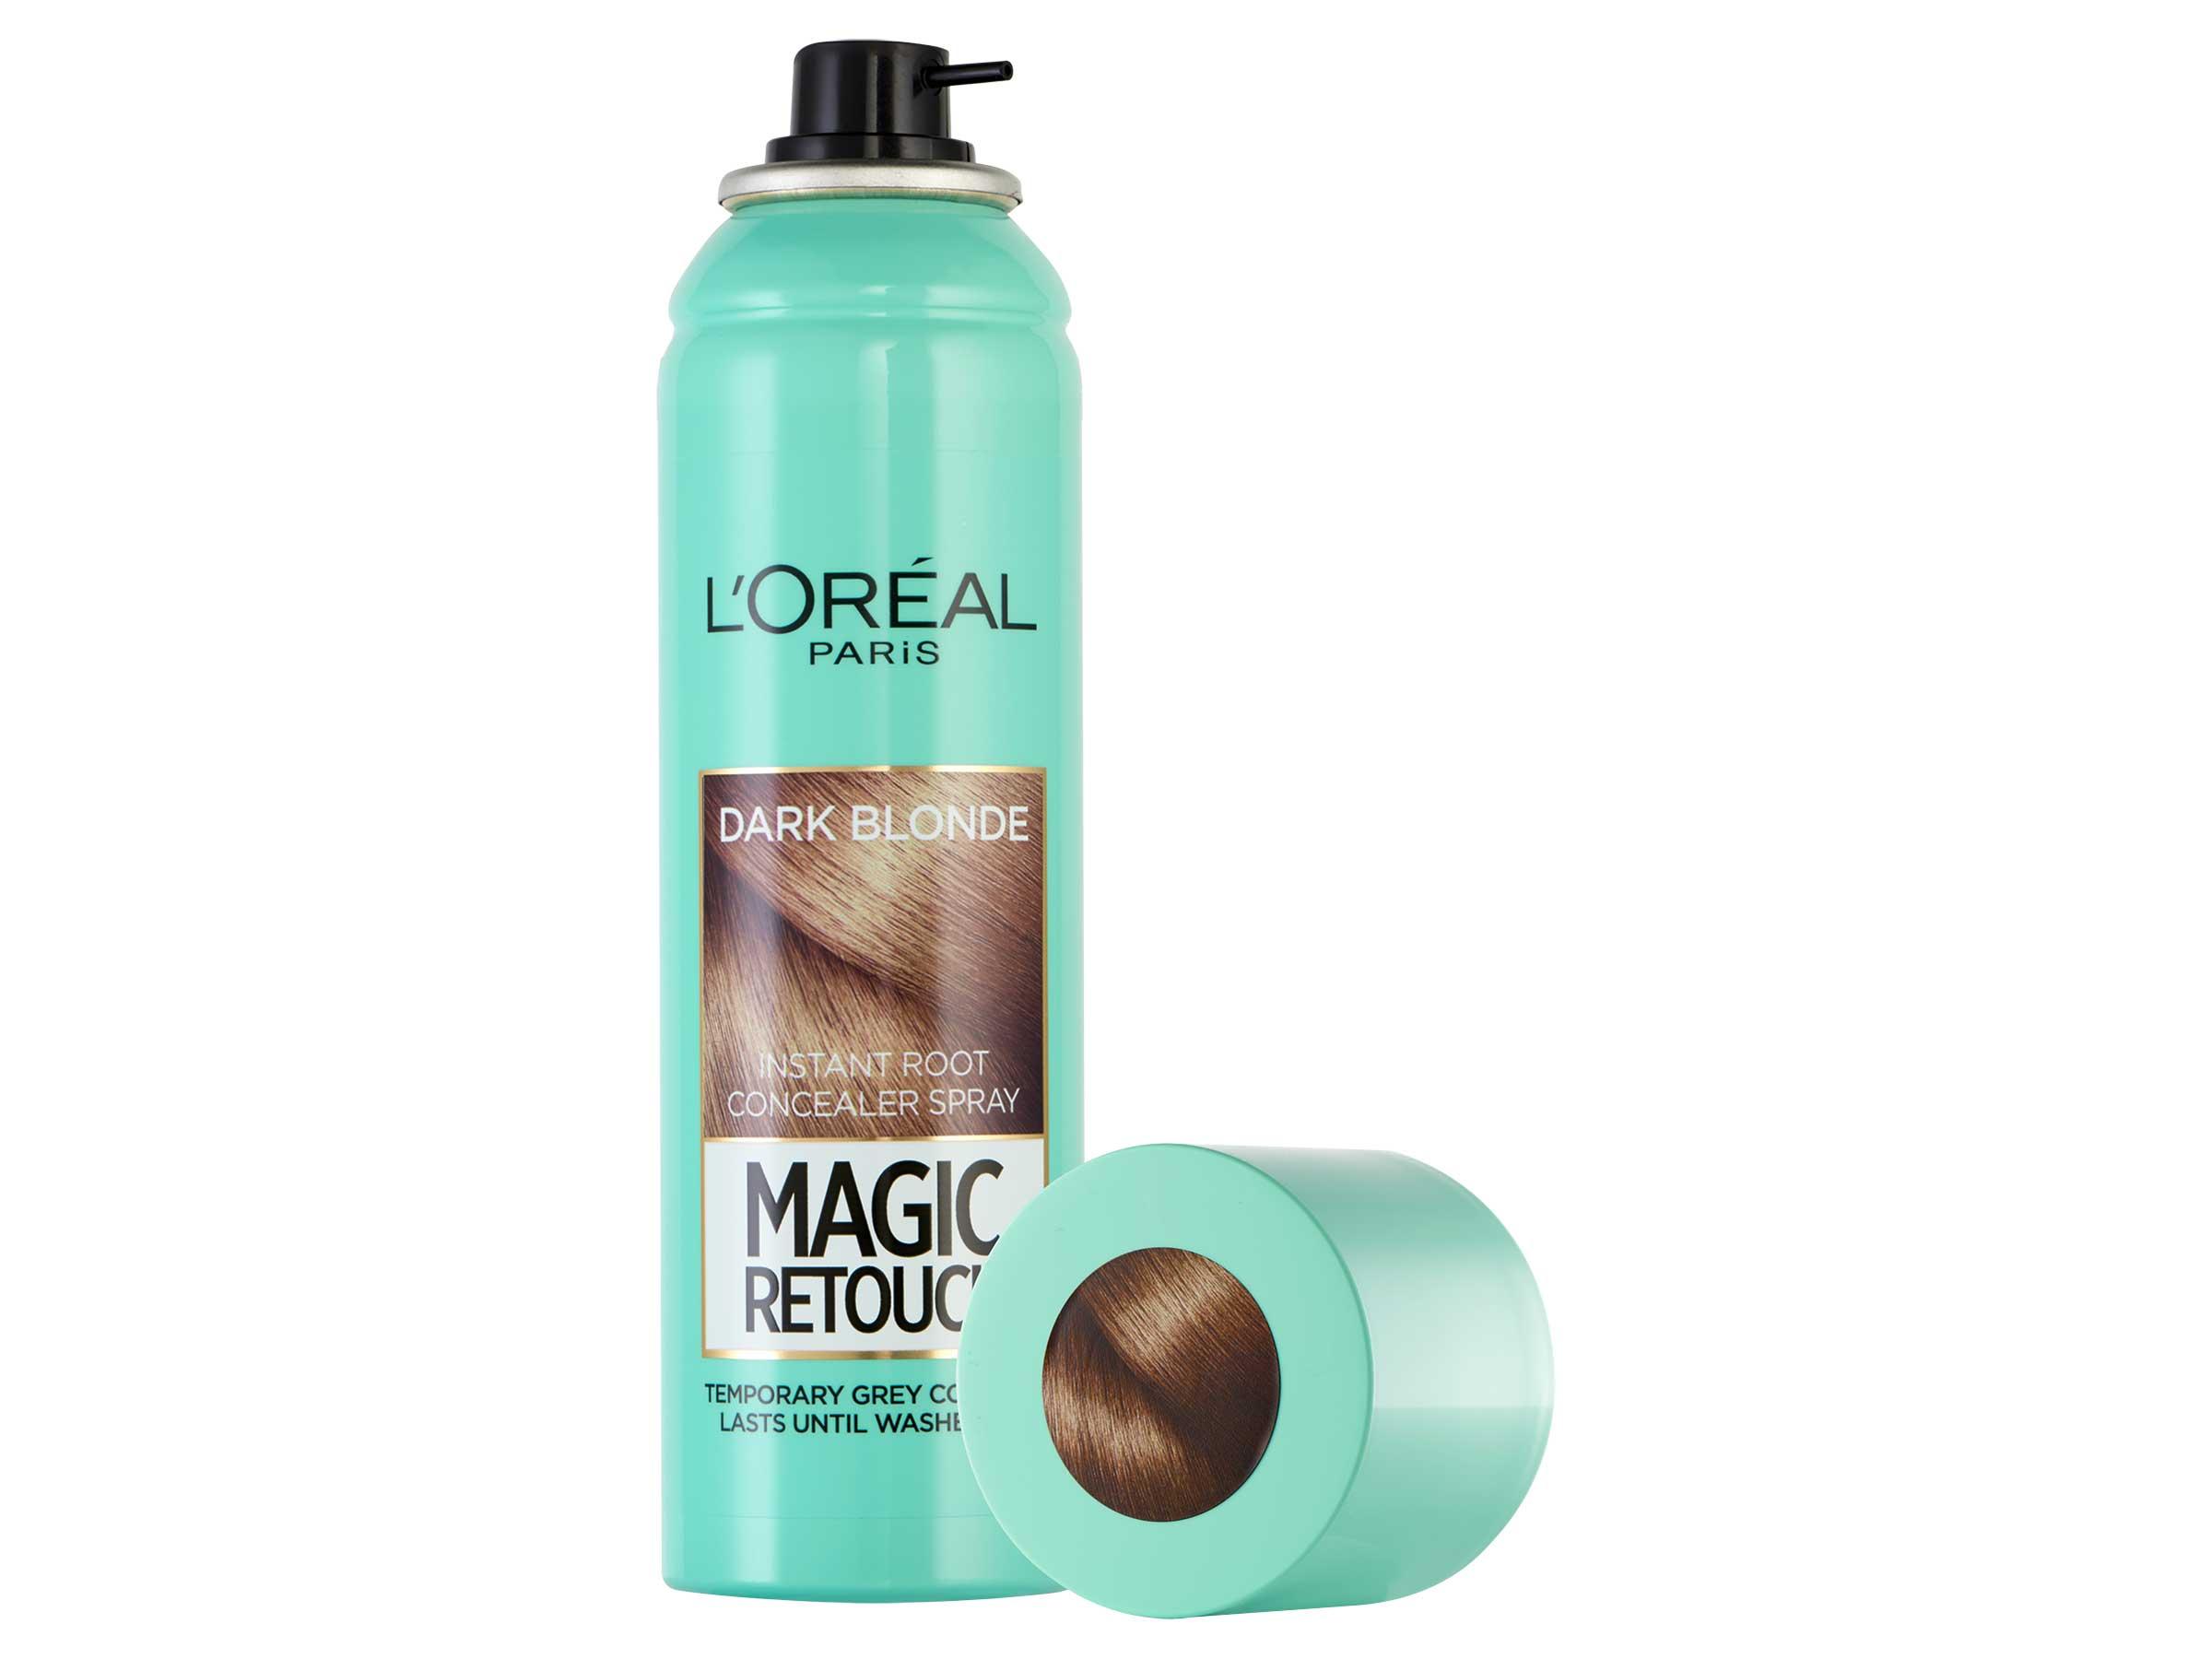 3-L'Oreal-Magic-Retouch3.jpg